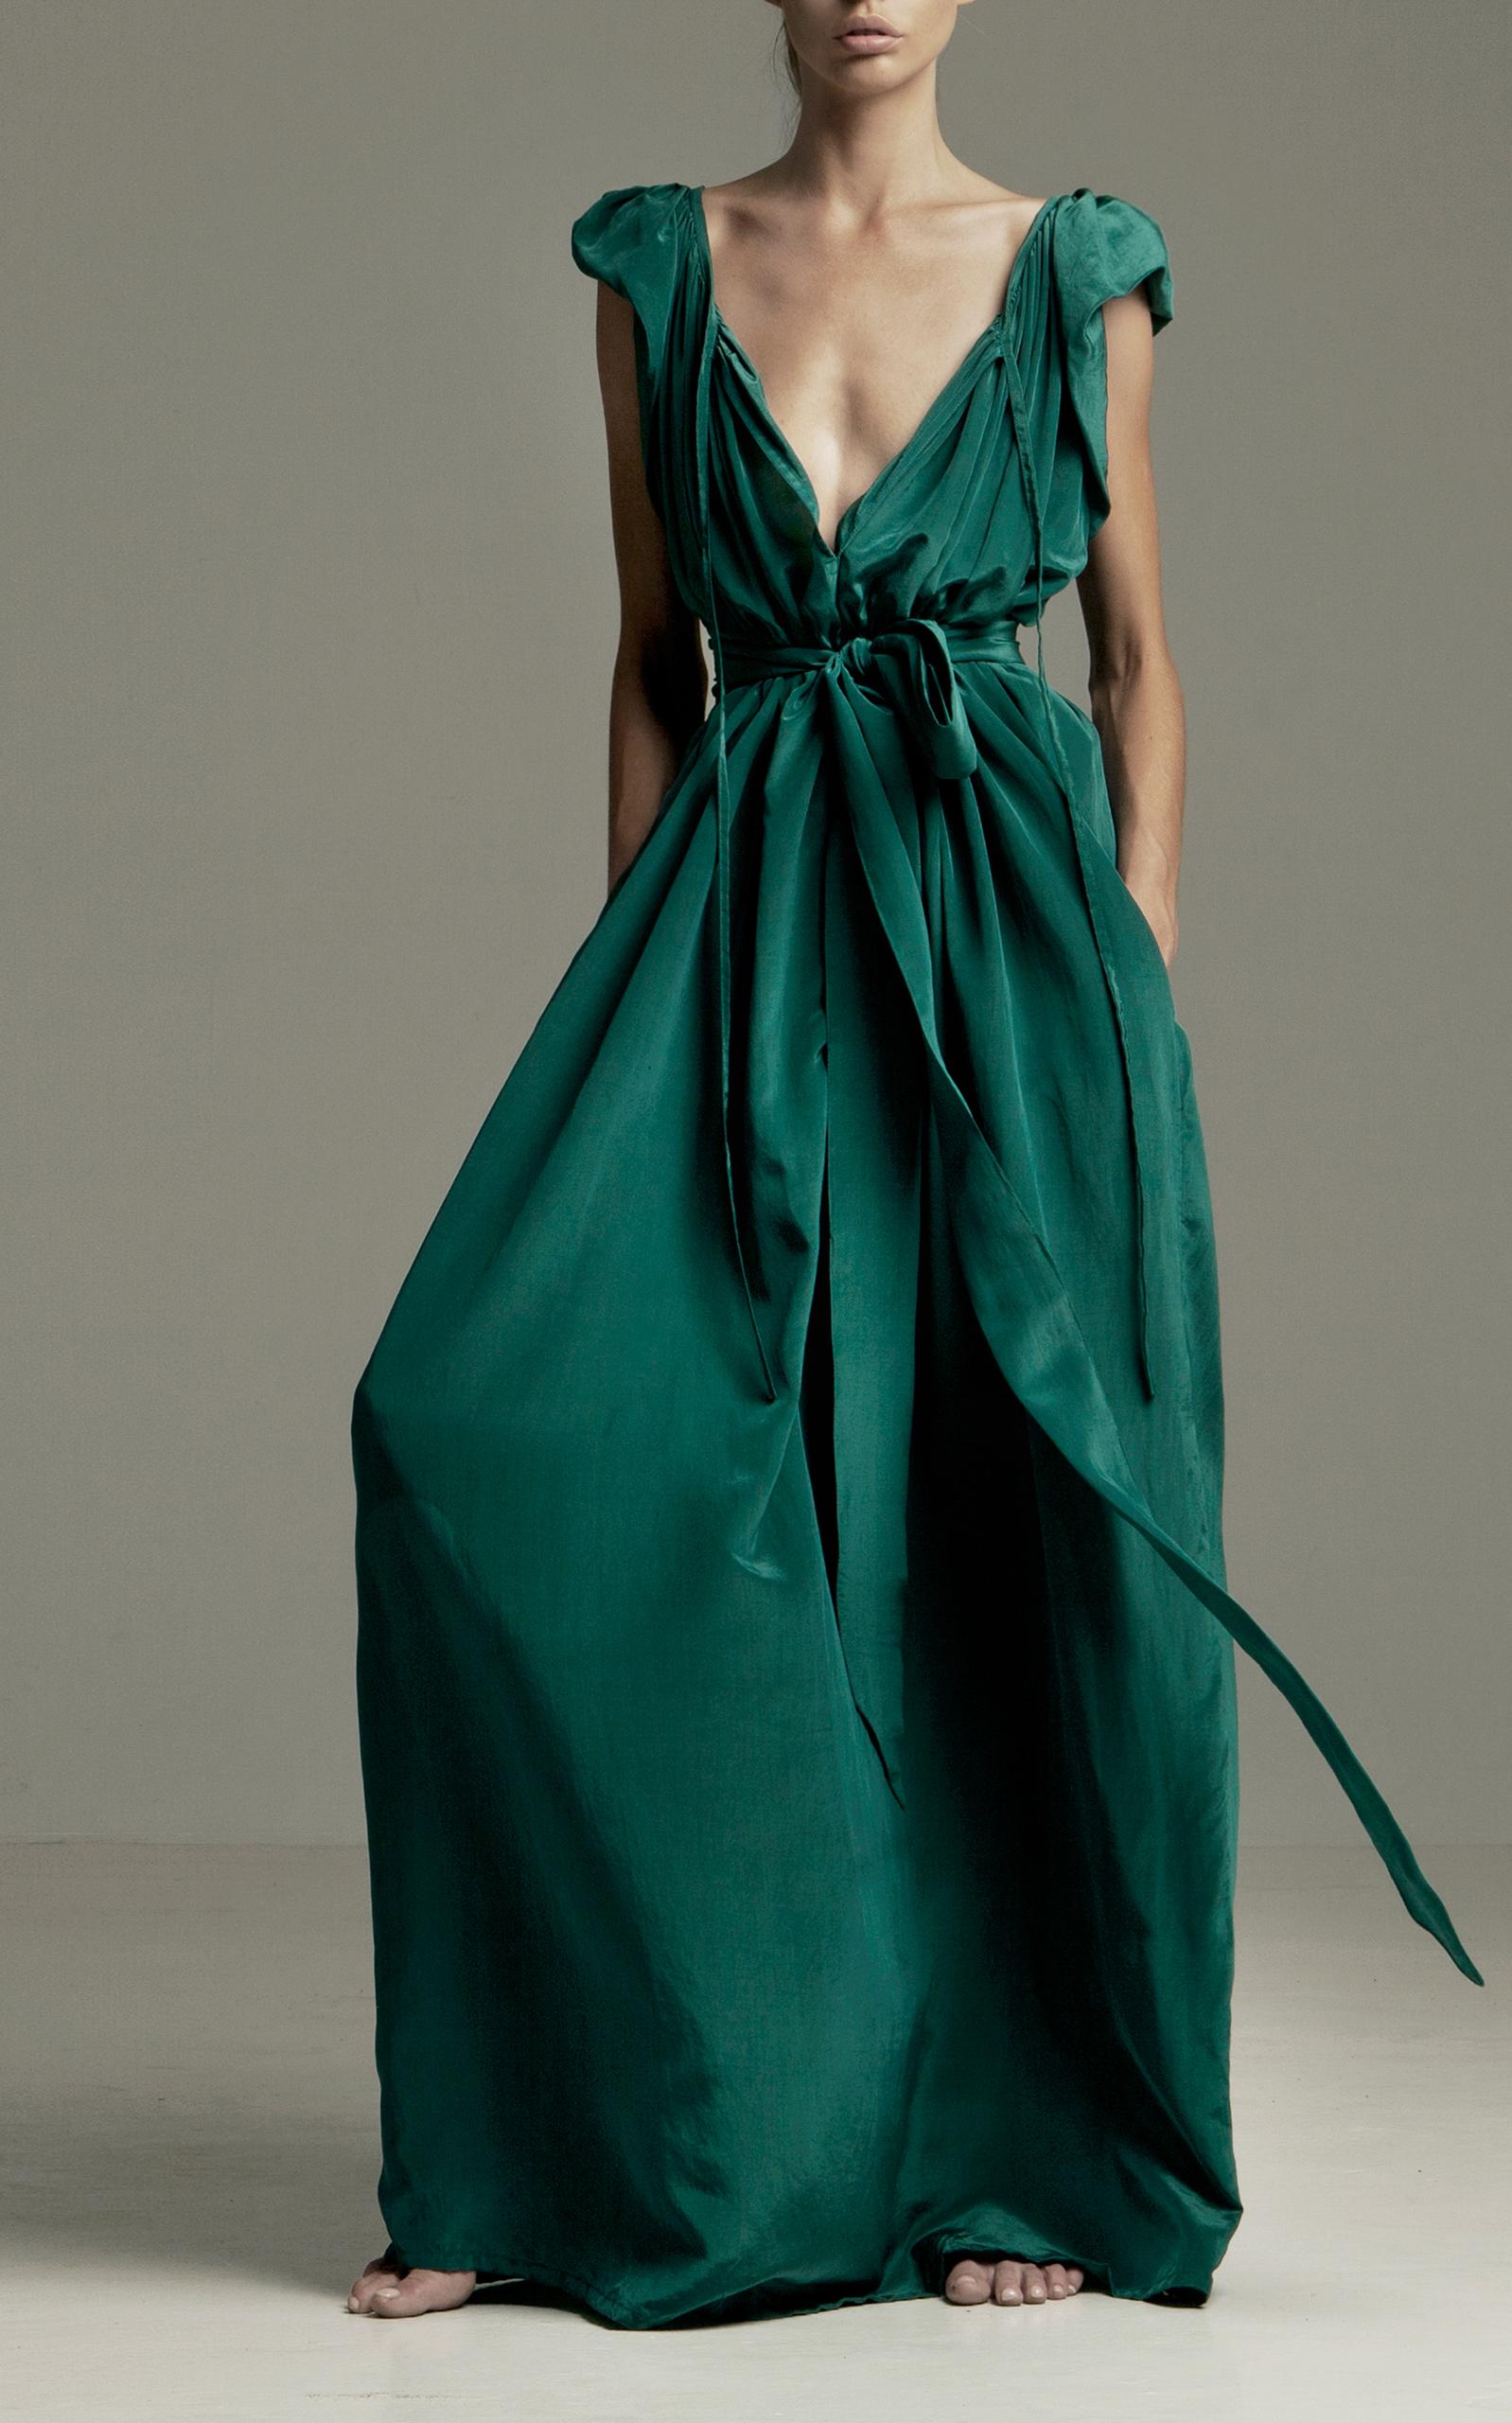 Andromeda Nights silk-blend dress Kalita ajrZnSd6